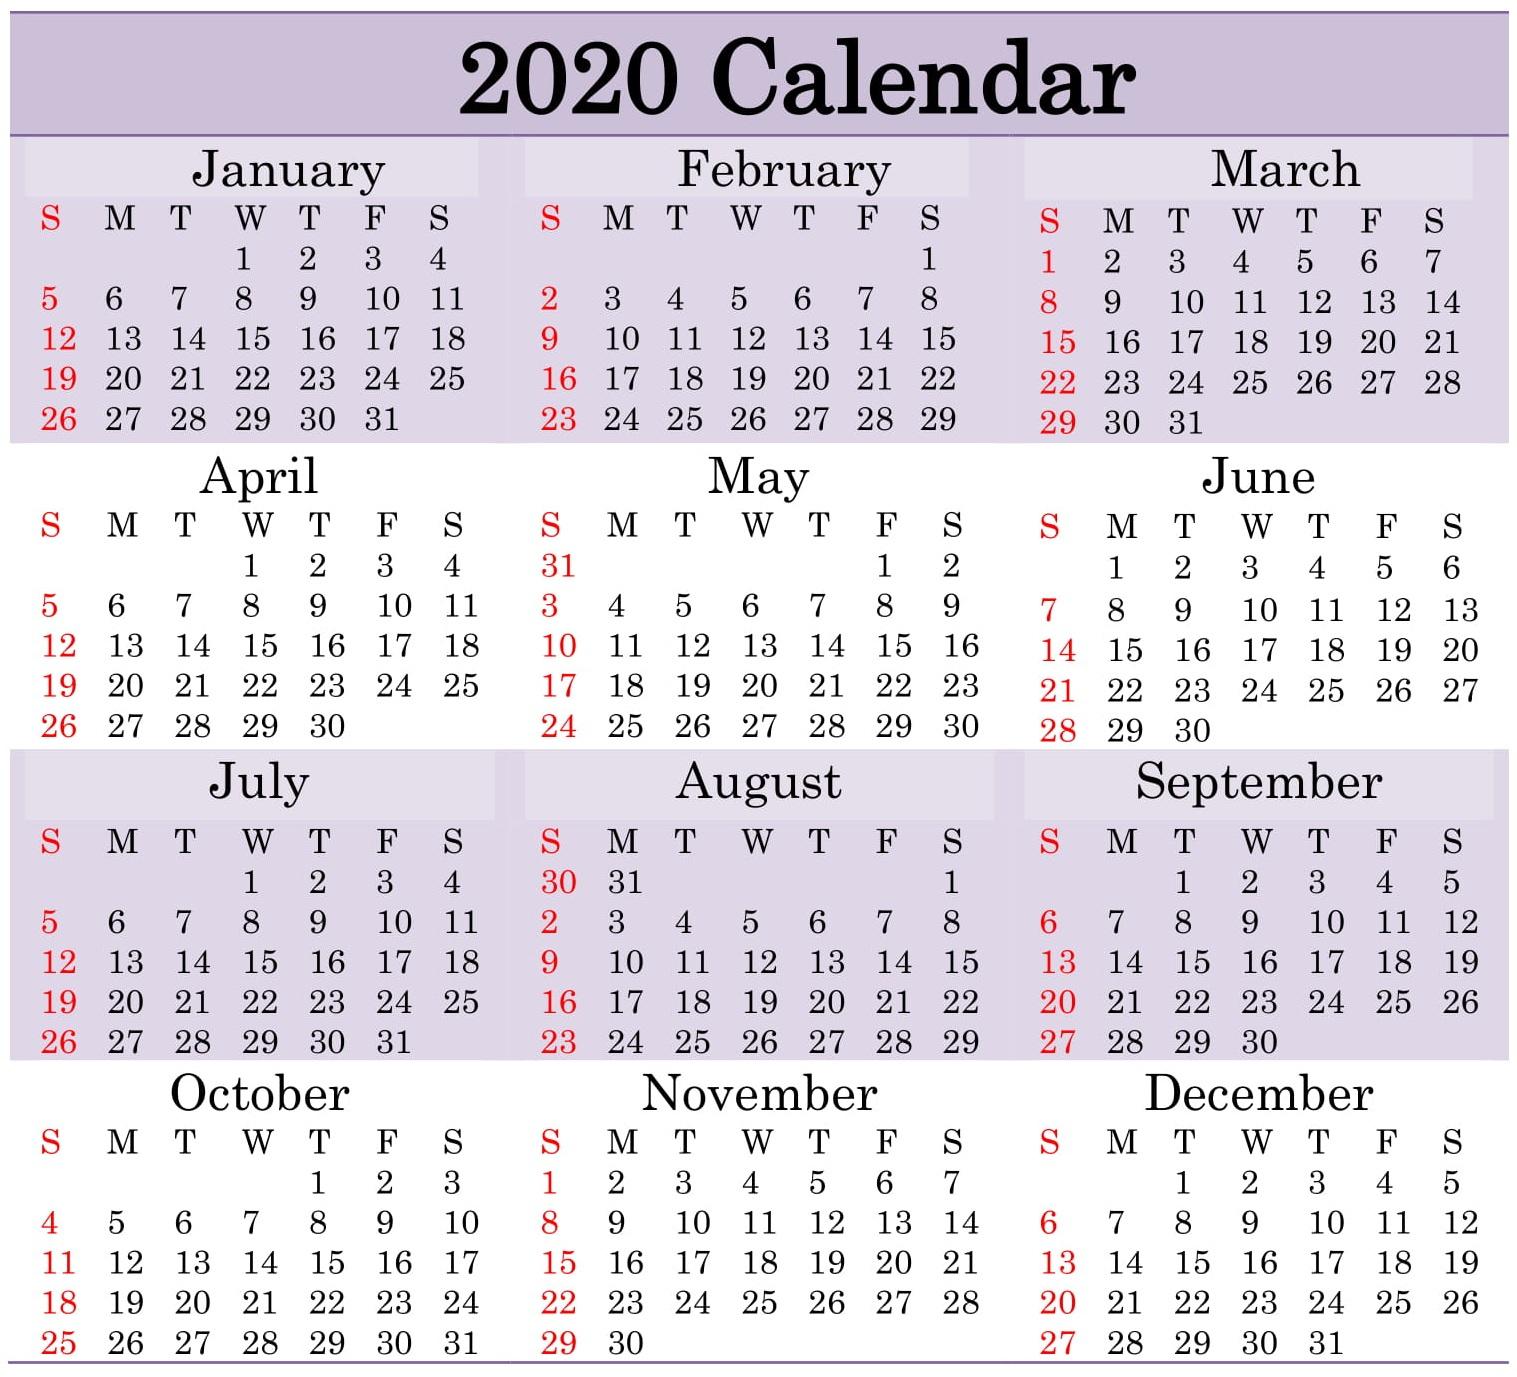 Printable 2020 Calendar Word Document  Latest Printable inside Julian Date Calendar 2020